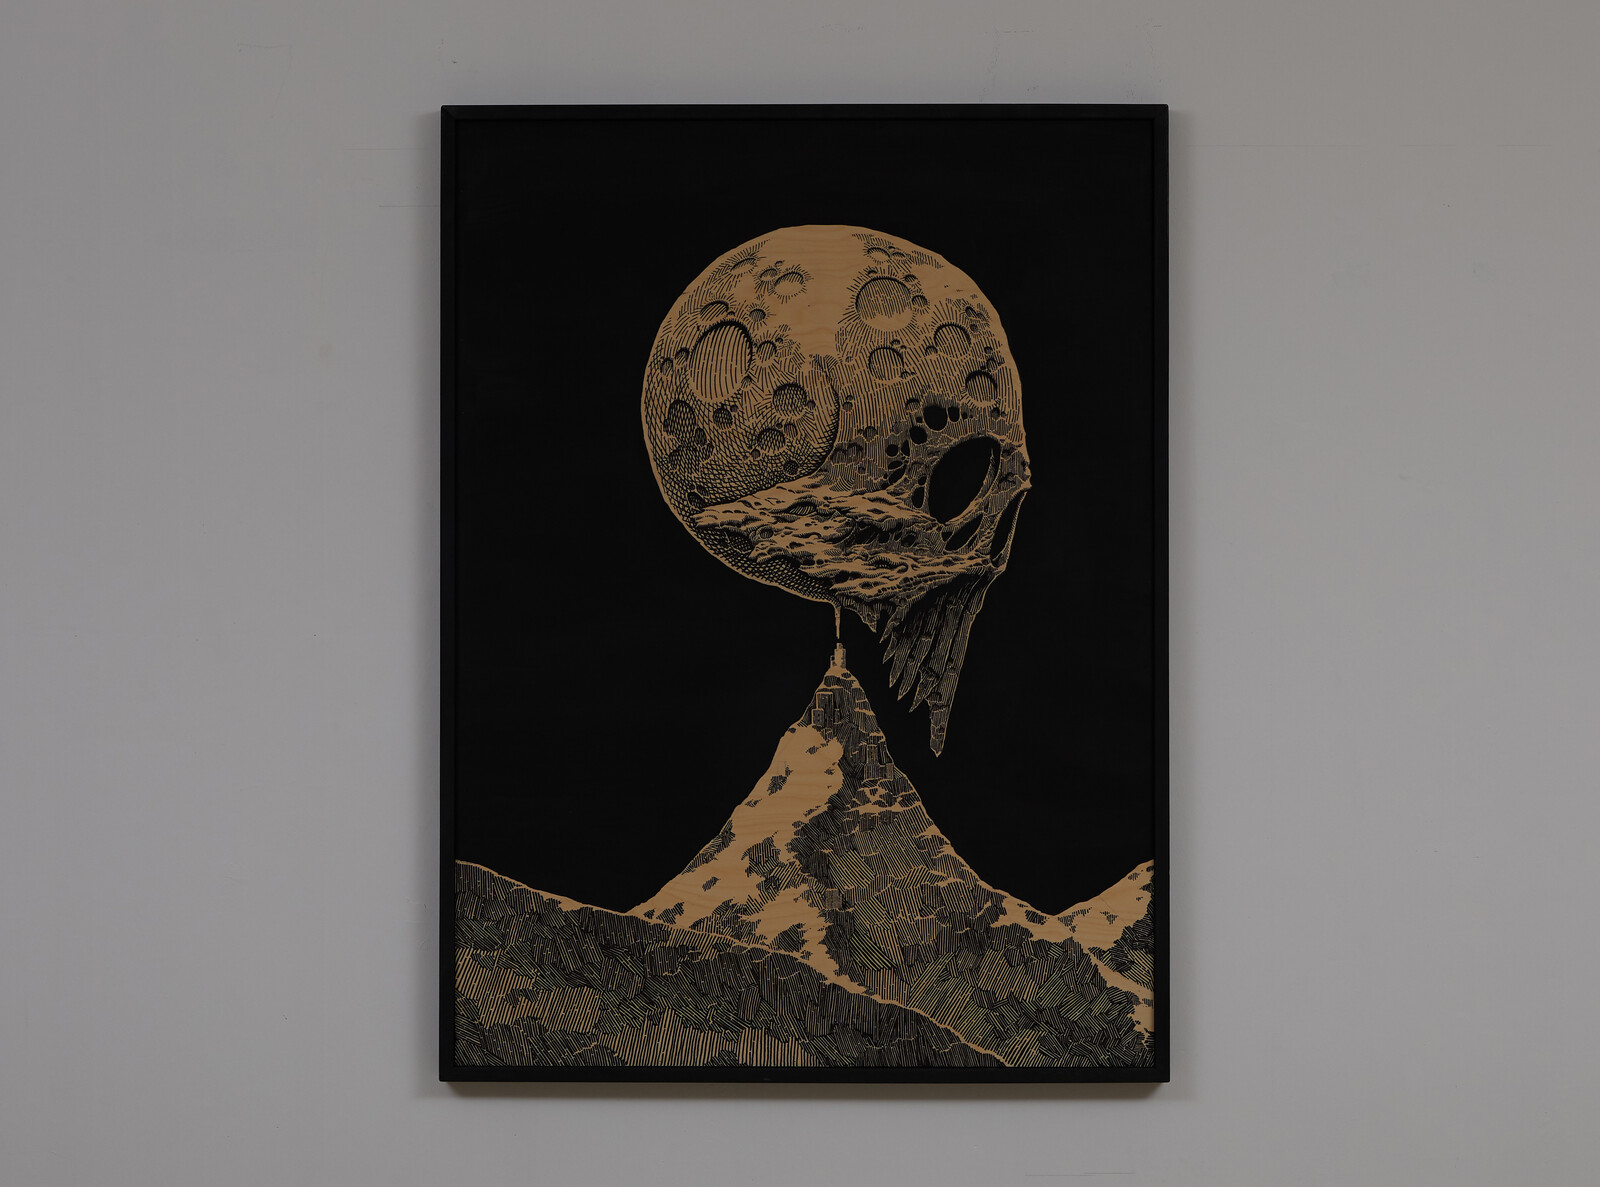 Blue Moon. 2020. Marker on wooden panel, 122 x 80 cm.